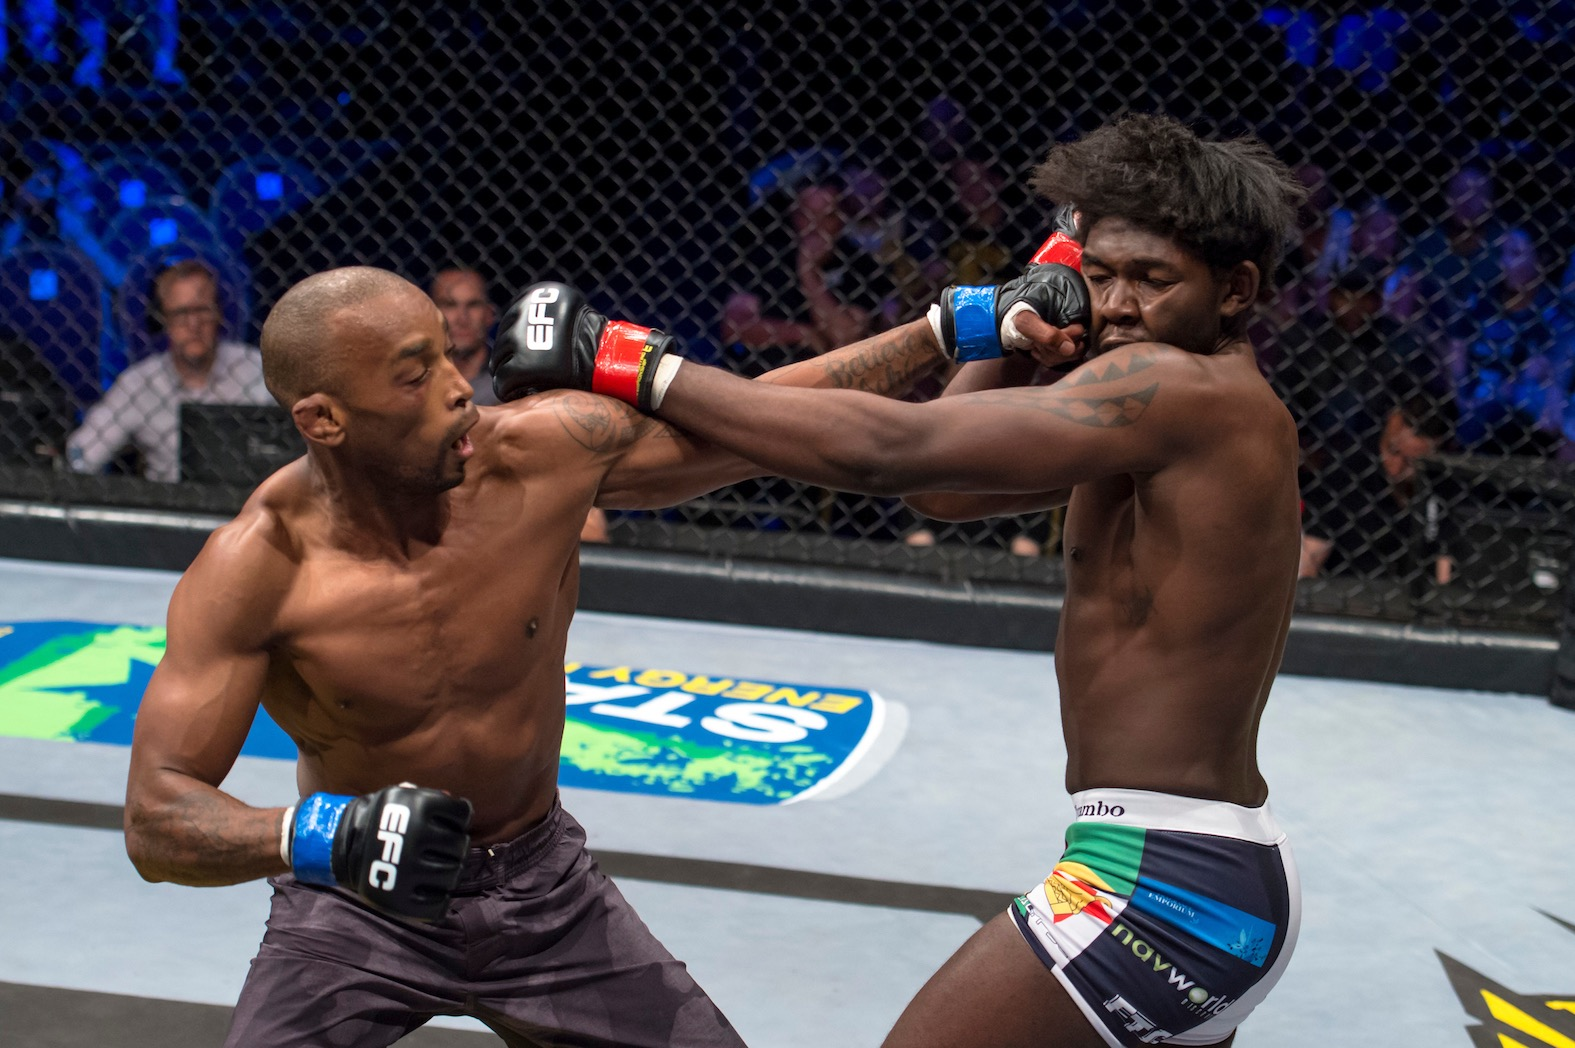 Regis Muyambo vs Sindile Manengela